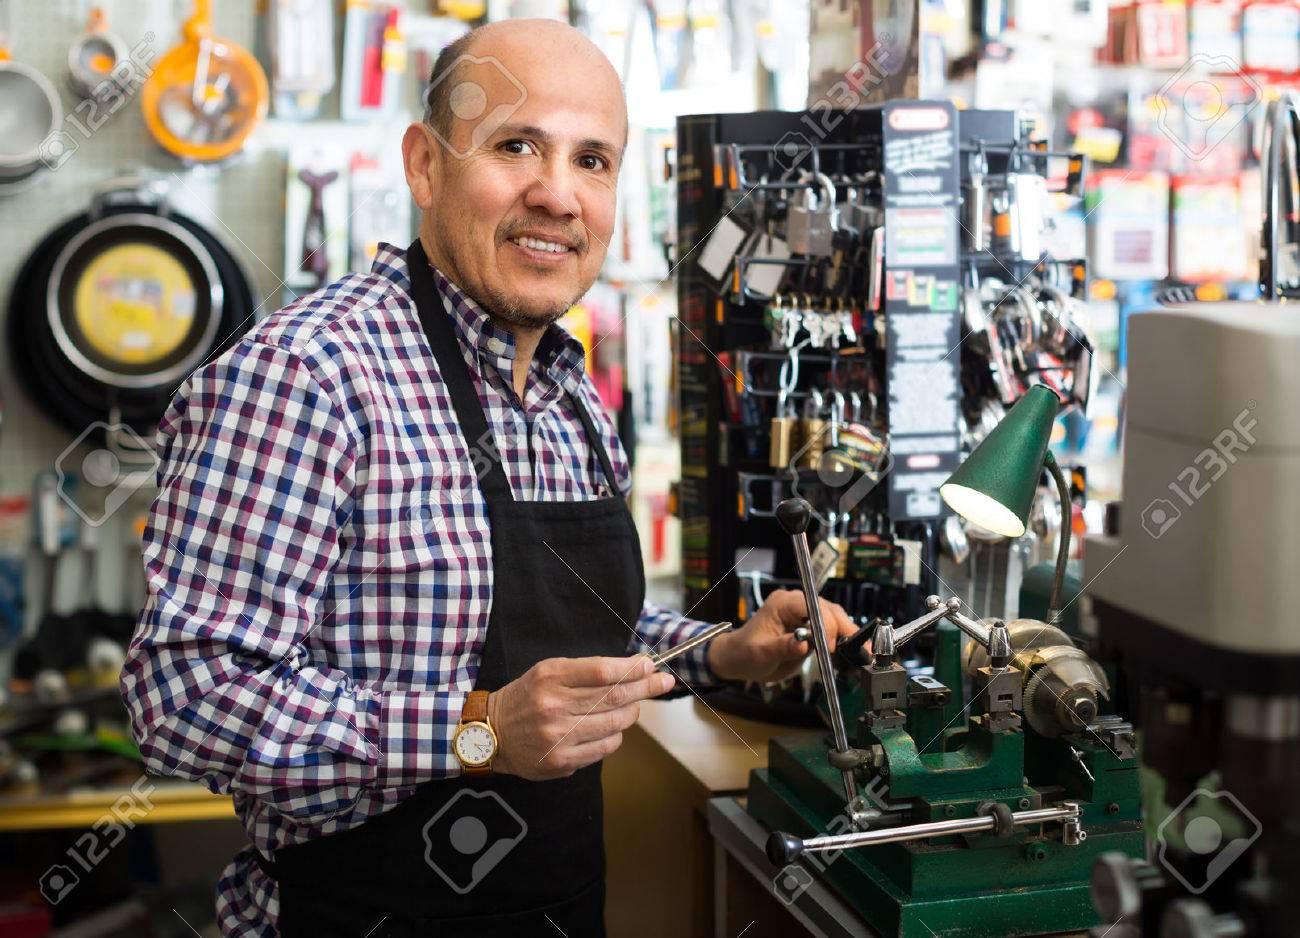 Elderly man in apron working in locksmith and making duplicates of keys Stock Photo - 56476374